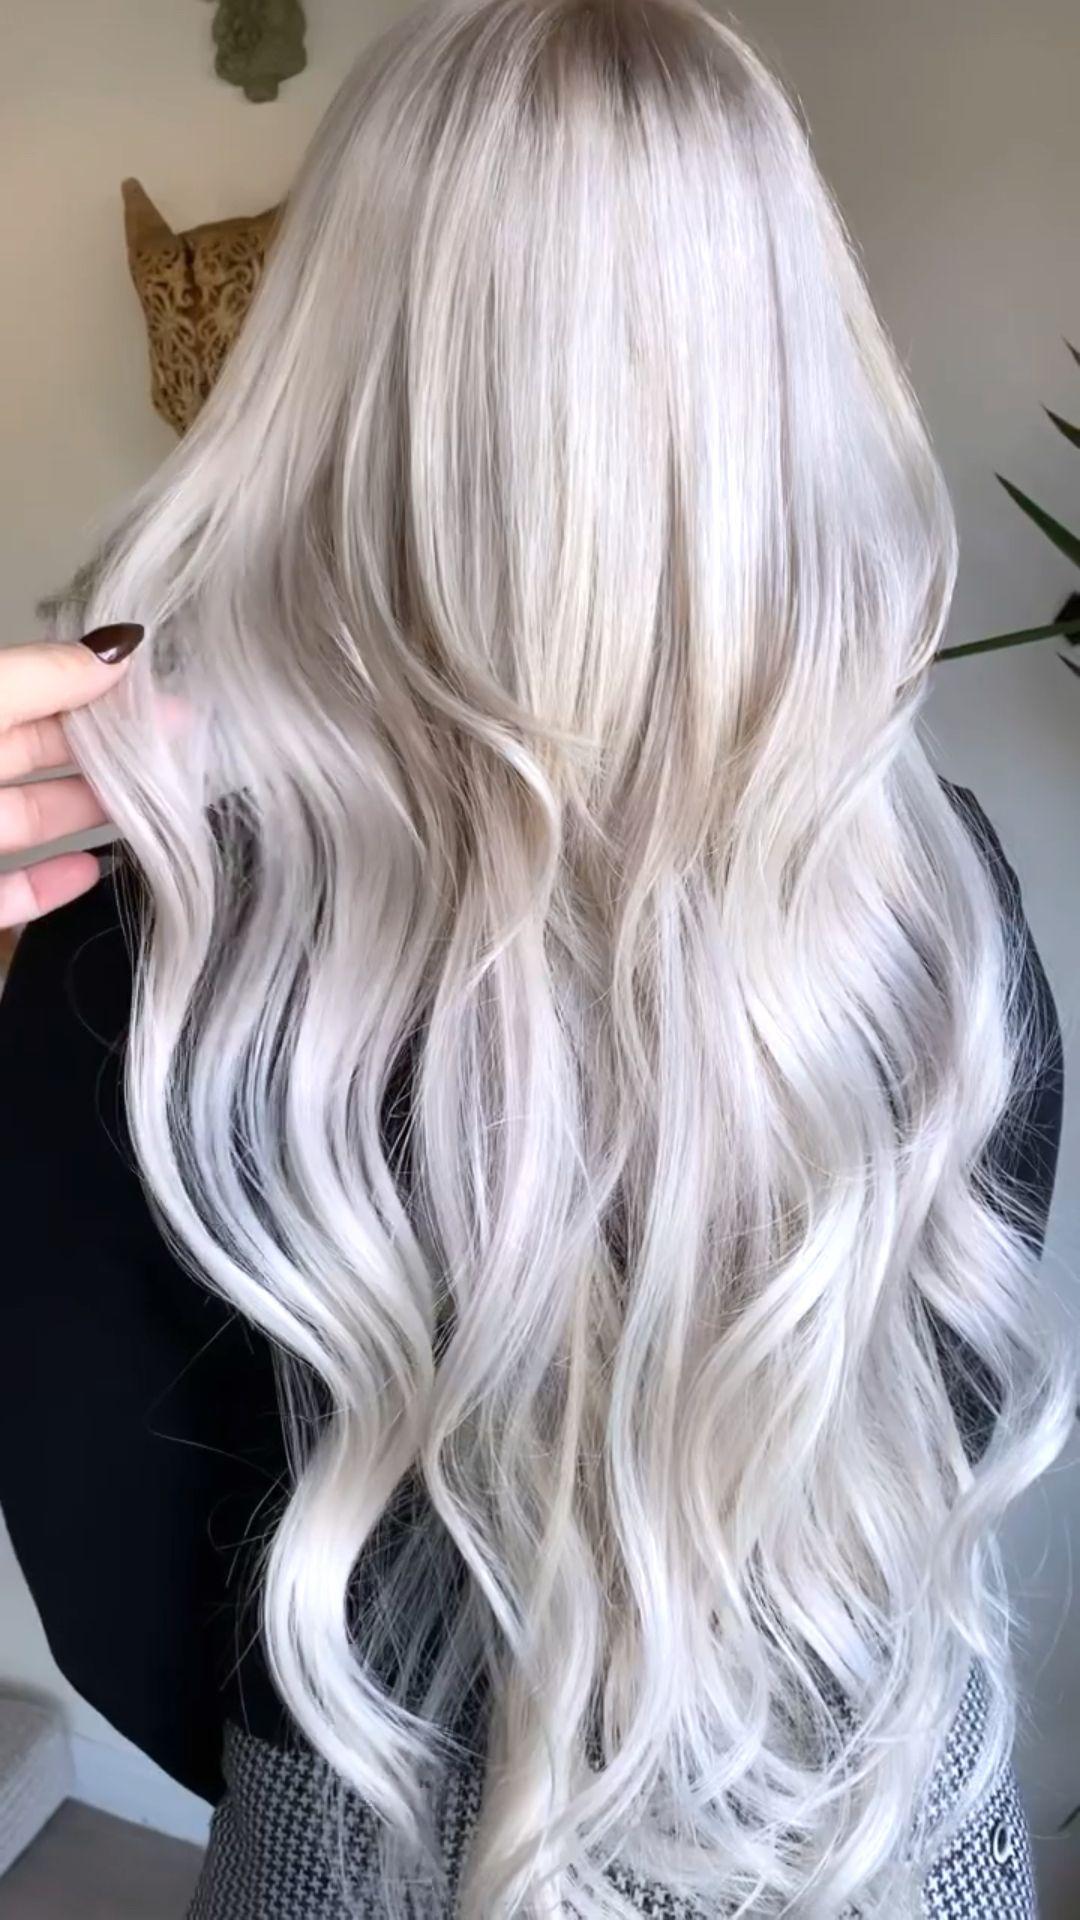 Hair Extension Transformation